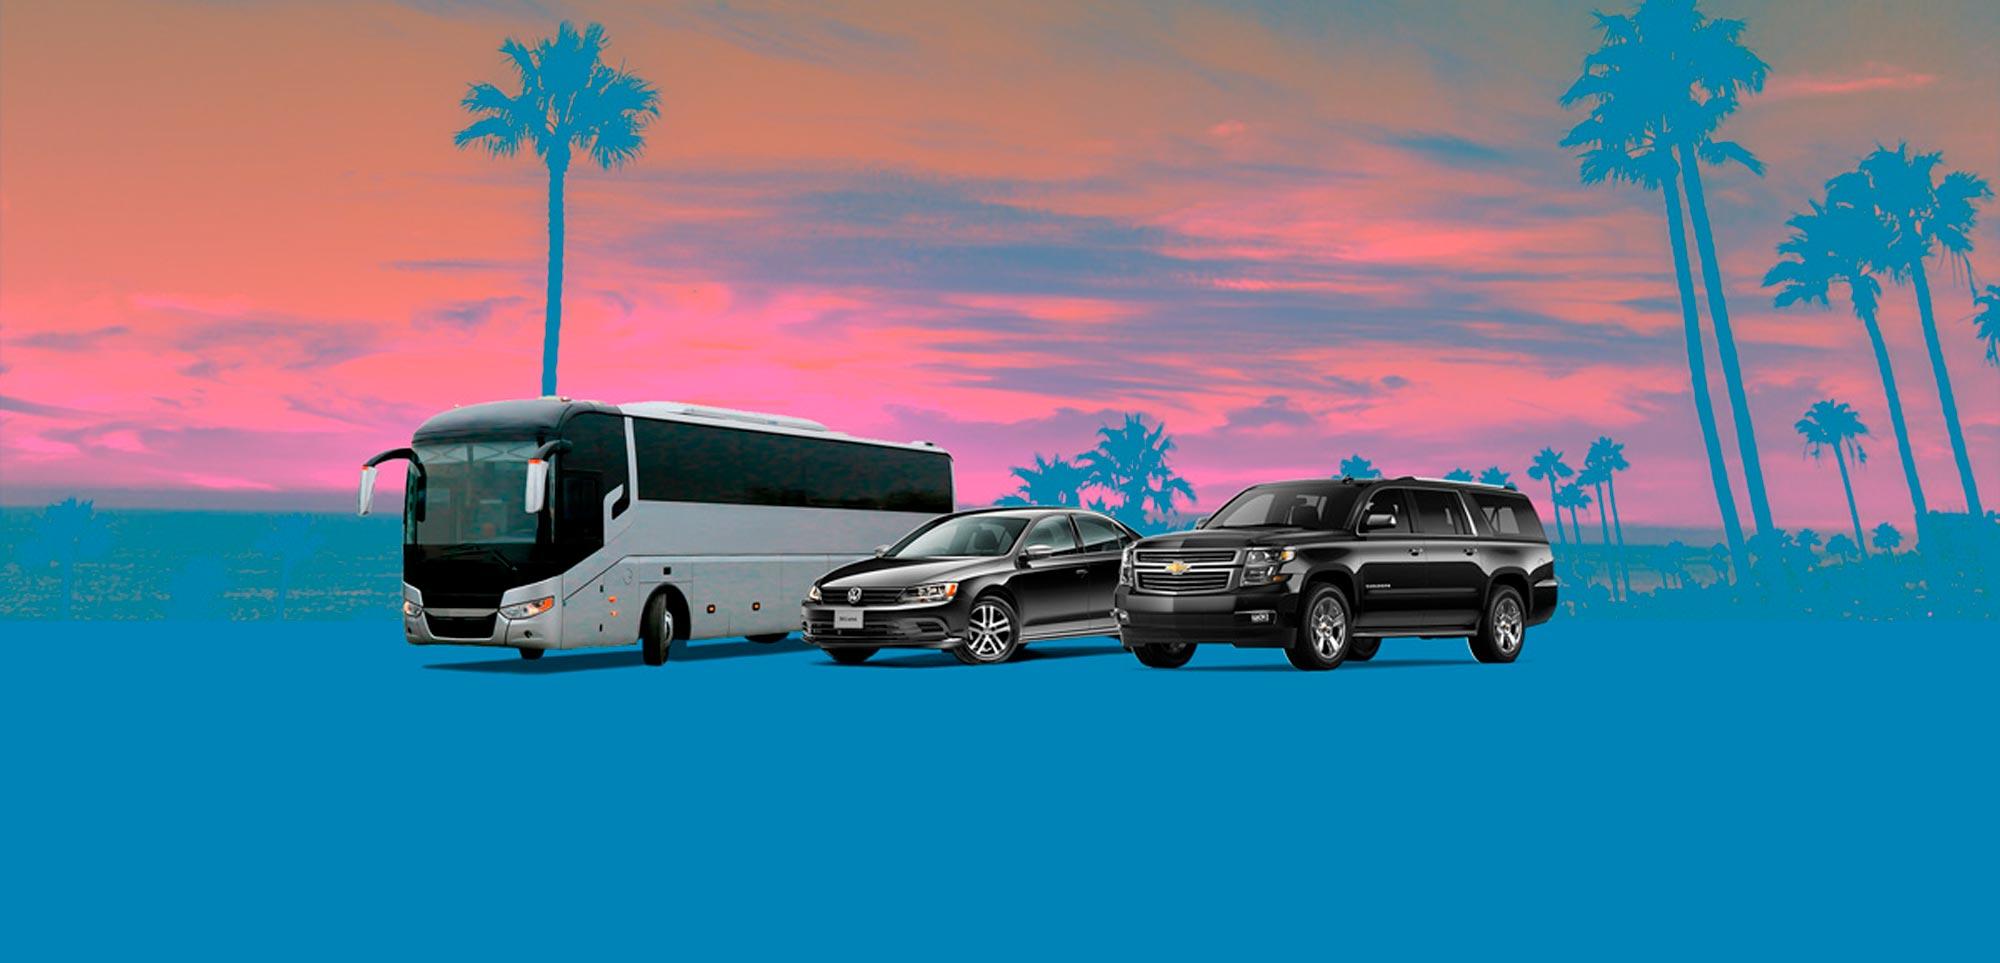 boom-agencia-marketing-digital-branding-travel-transport-elementos